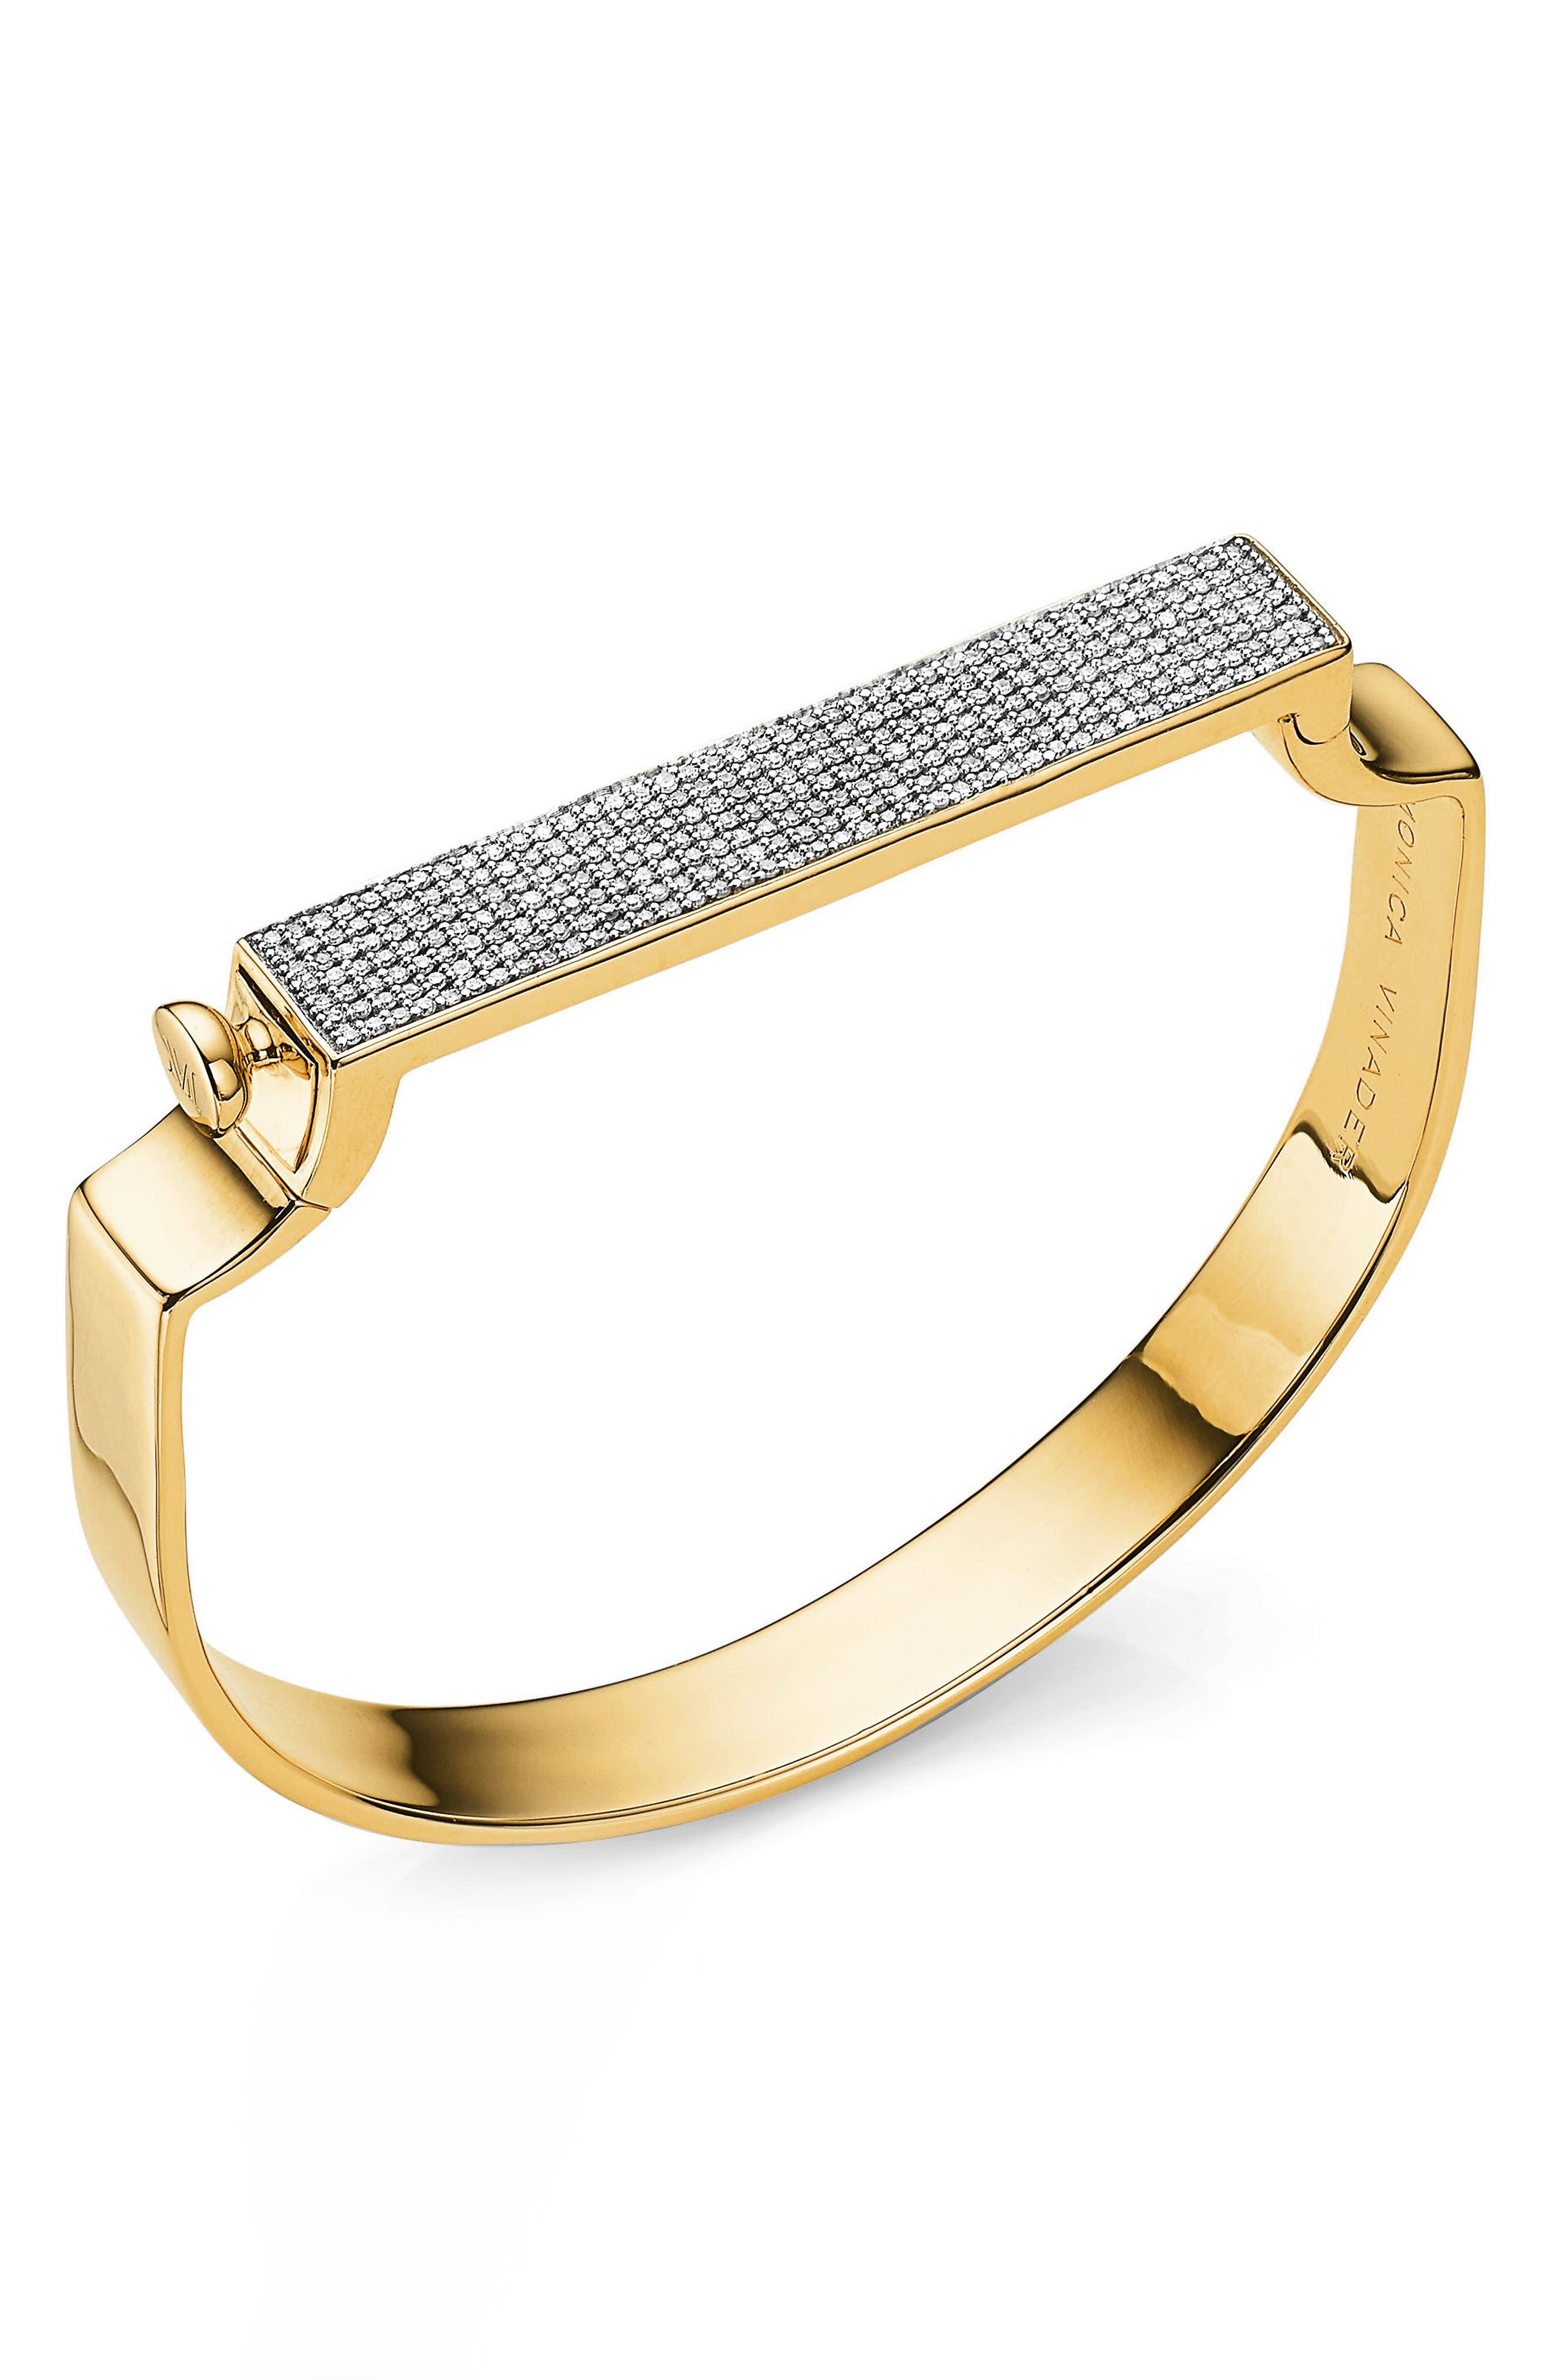 Signature Diamond Bangle,                         Main,                         color, YELLOW GOLD